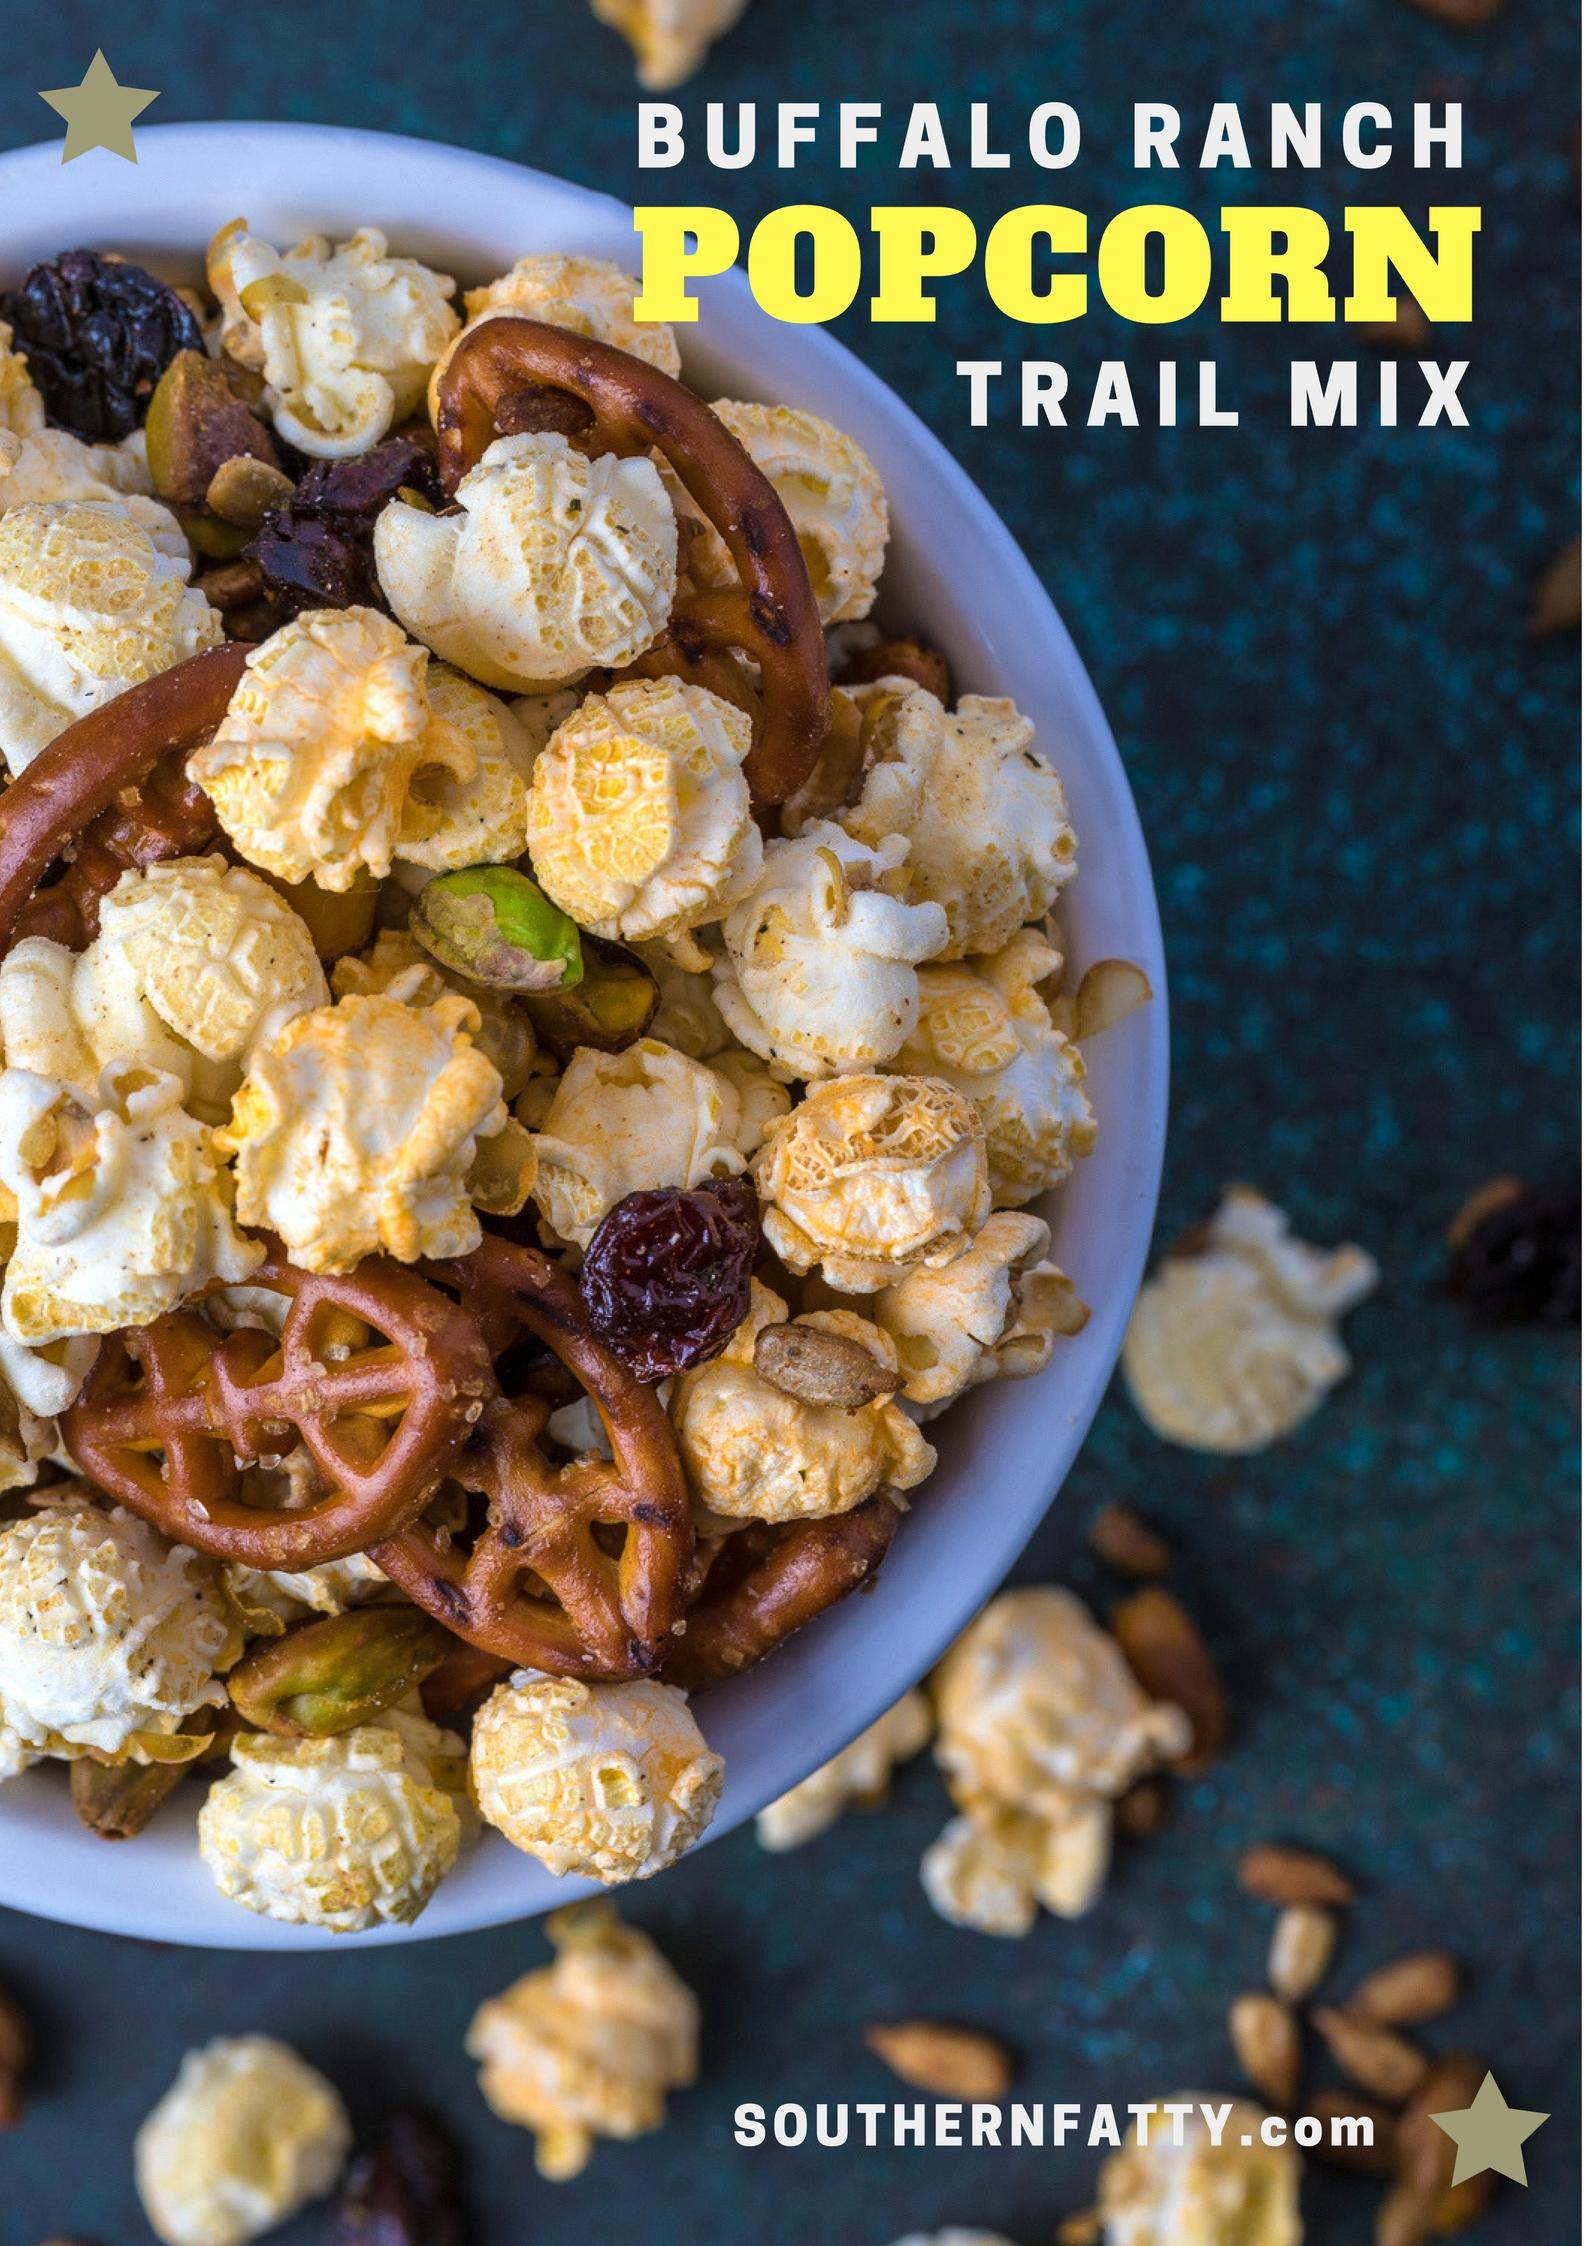 Buffalo Ranch Popcorn Trail Mix Recipe from SouthernFatty.com.